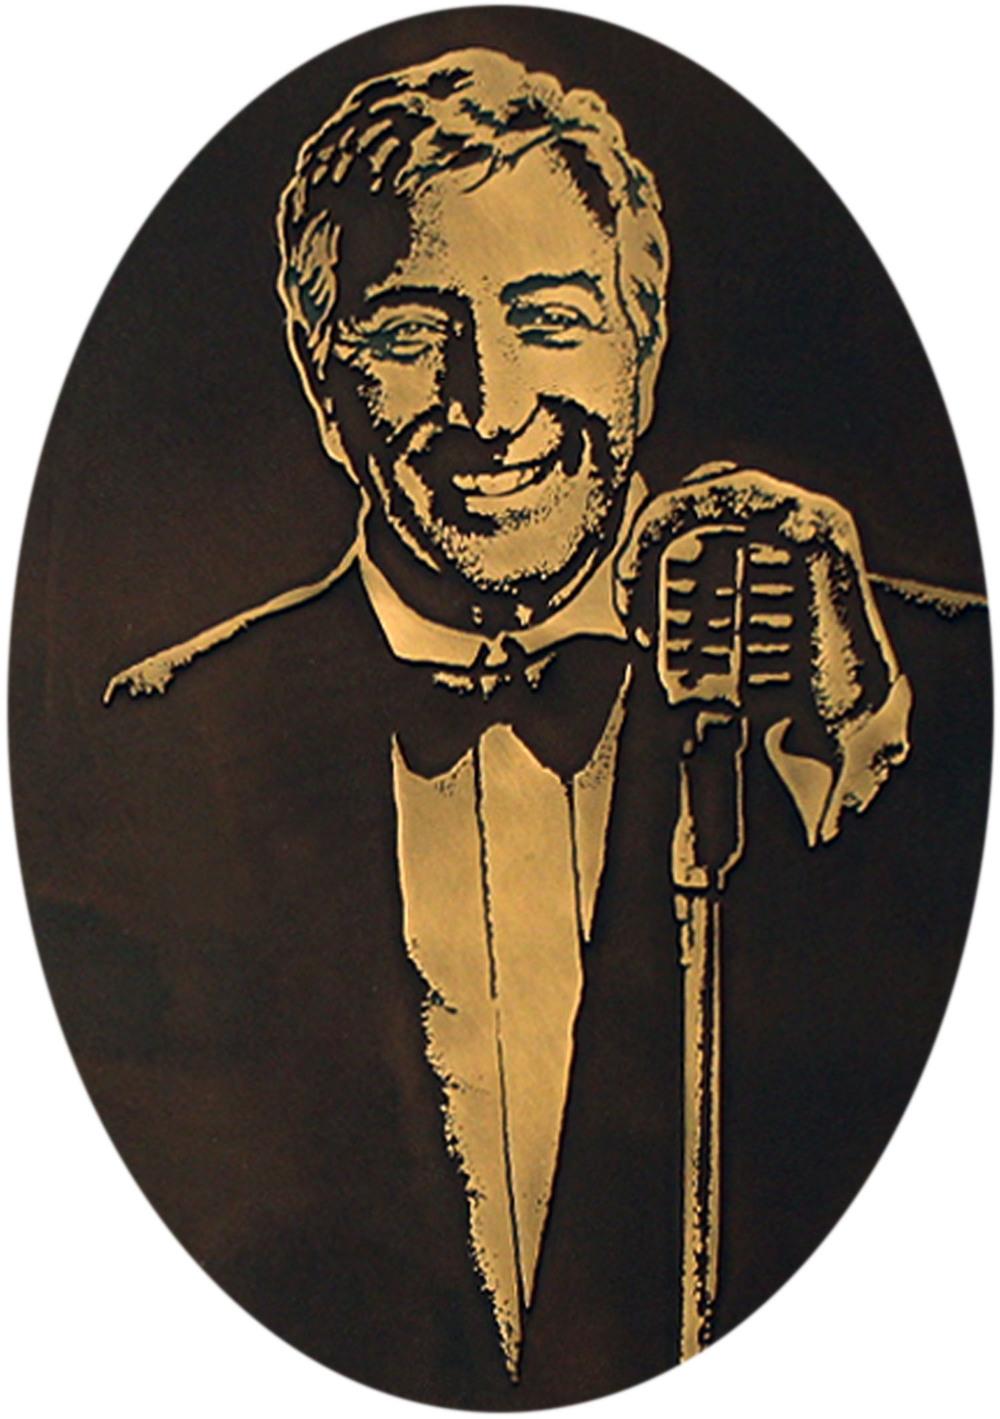 tony bennett-bronze plaque-illustrated portrait.jpg